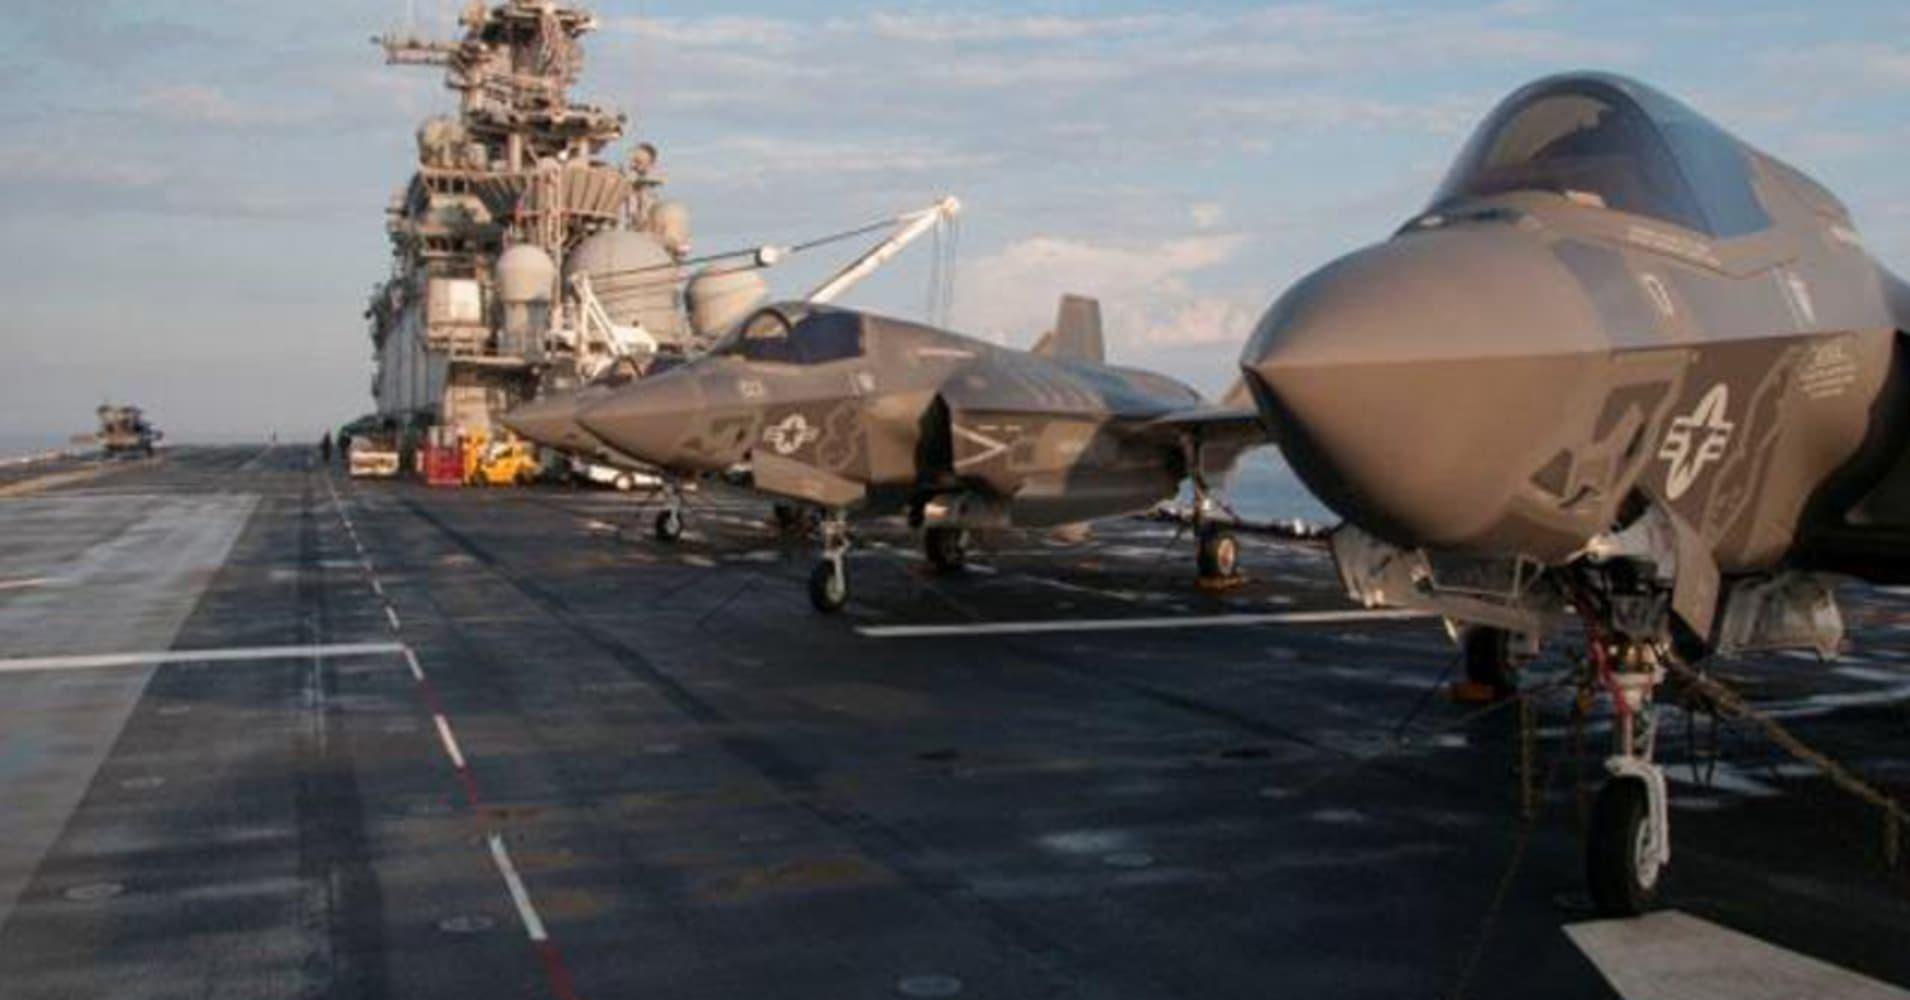 Lockheed wins $1.38 billion F-35 jet contract: Pentagon